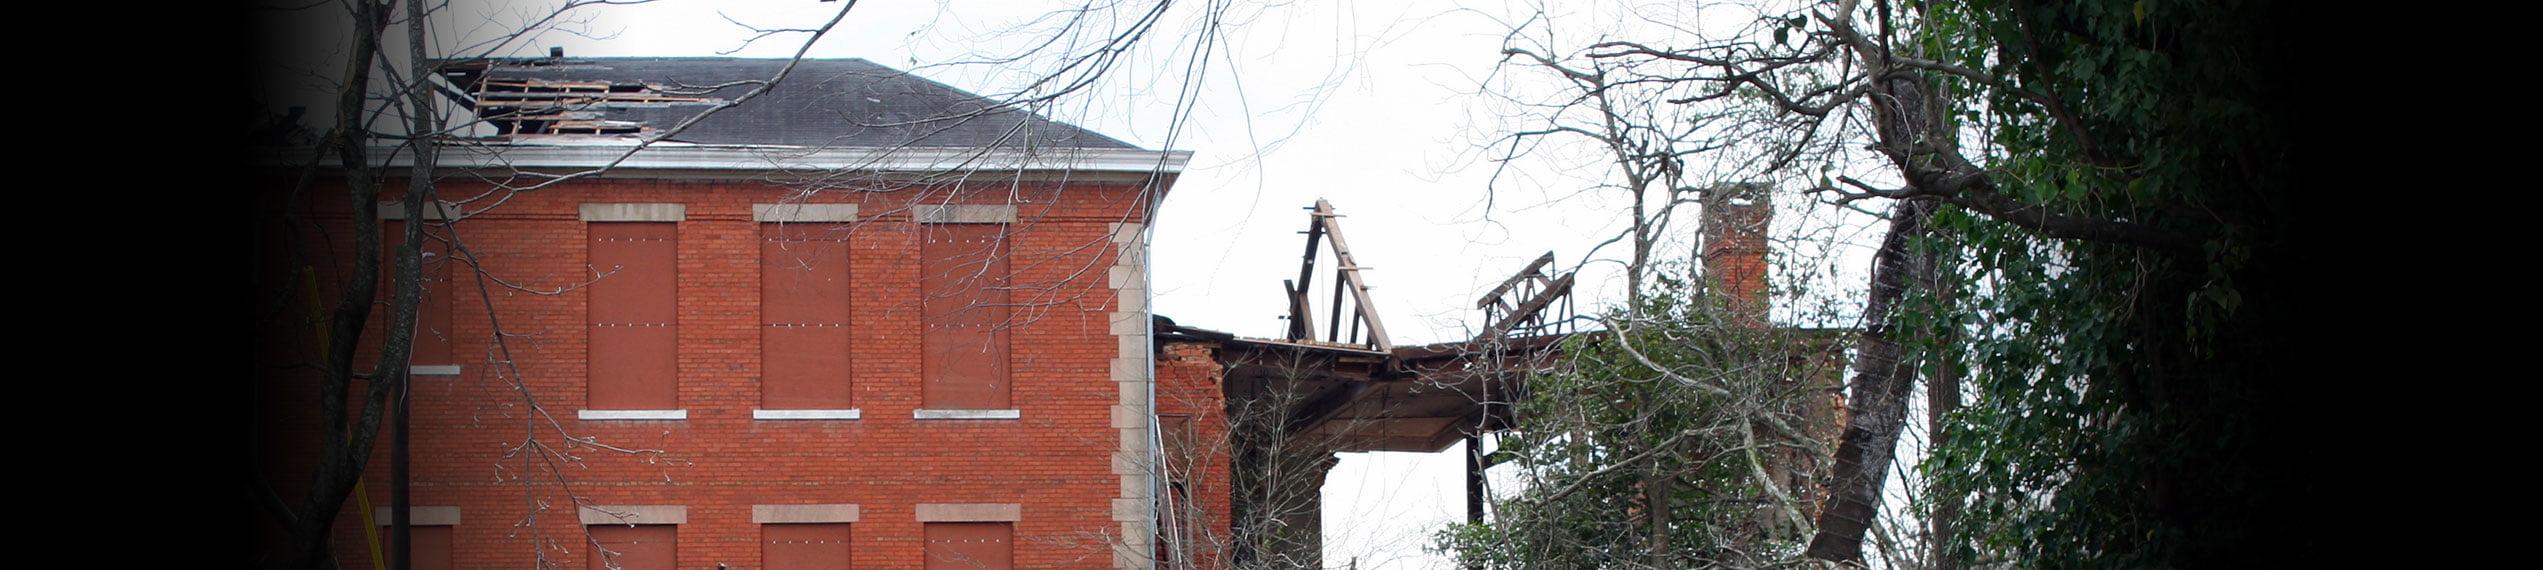 Wind & Storm Damage Repairs in Paul Davis Restoration of Bucks County PA